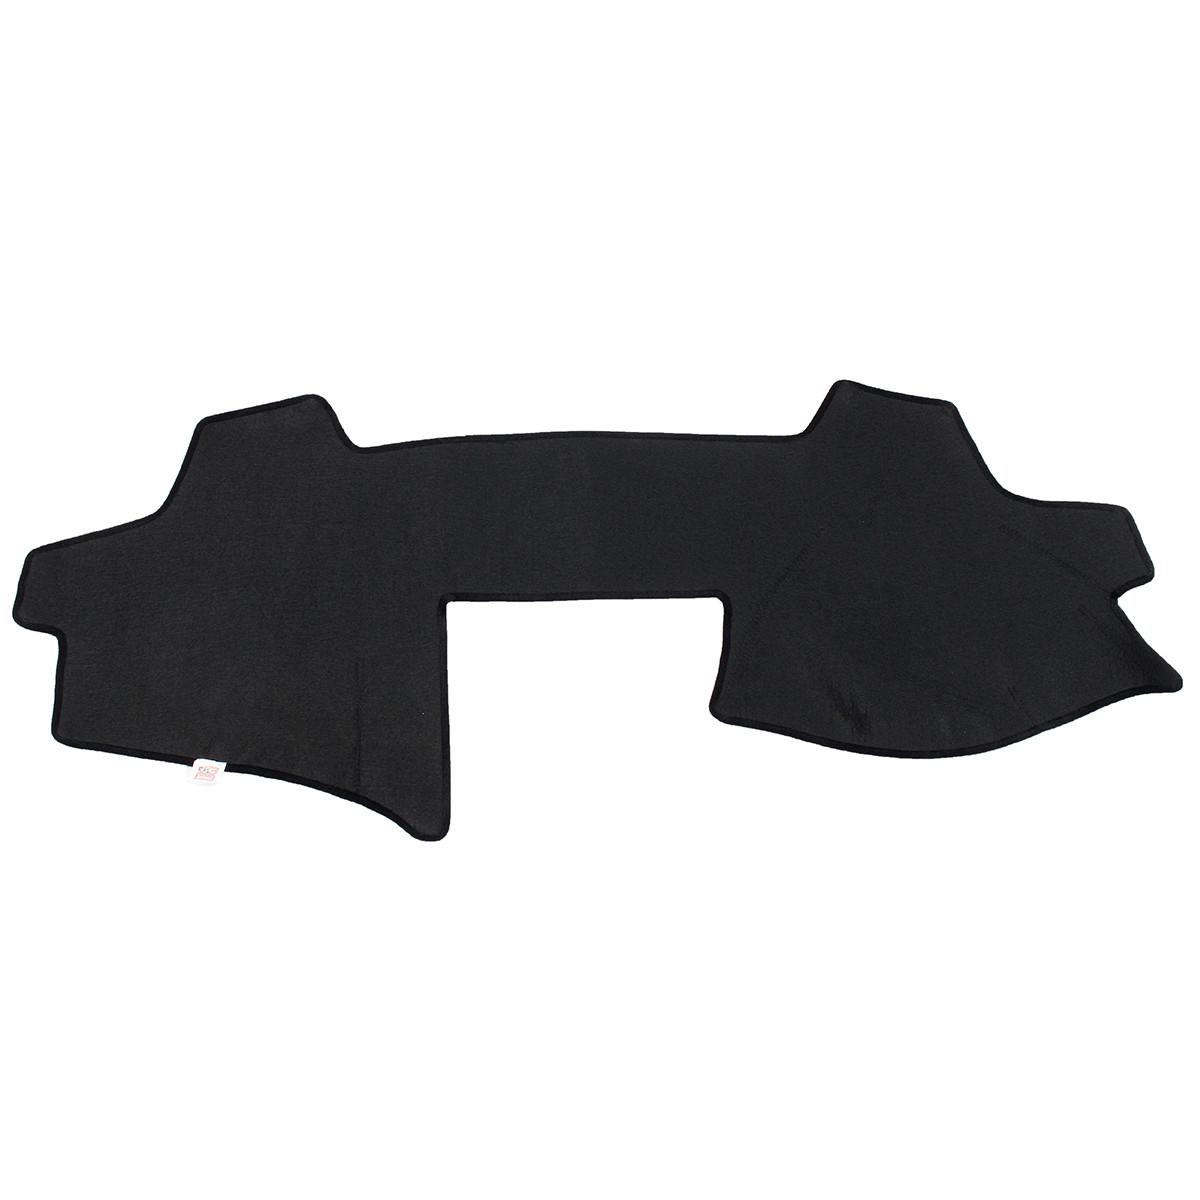 black felt car inner dashboard dashmat sun cover pad for toyota camry 2006 20. Black Bedroom Furniture Sets. Home Design Ideas